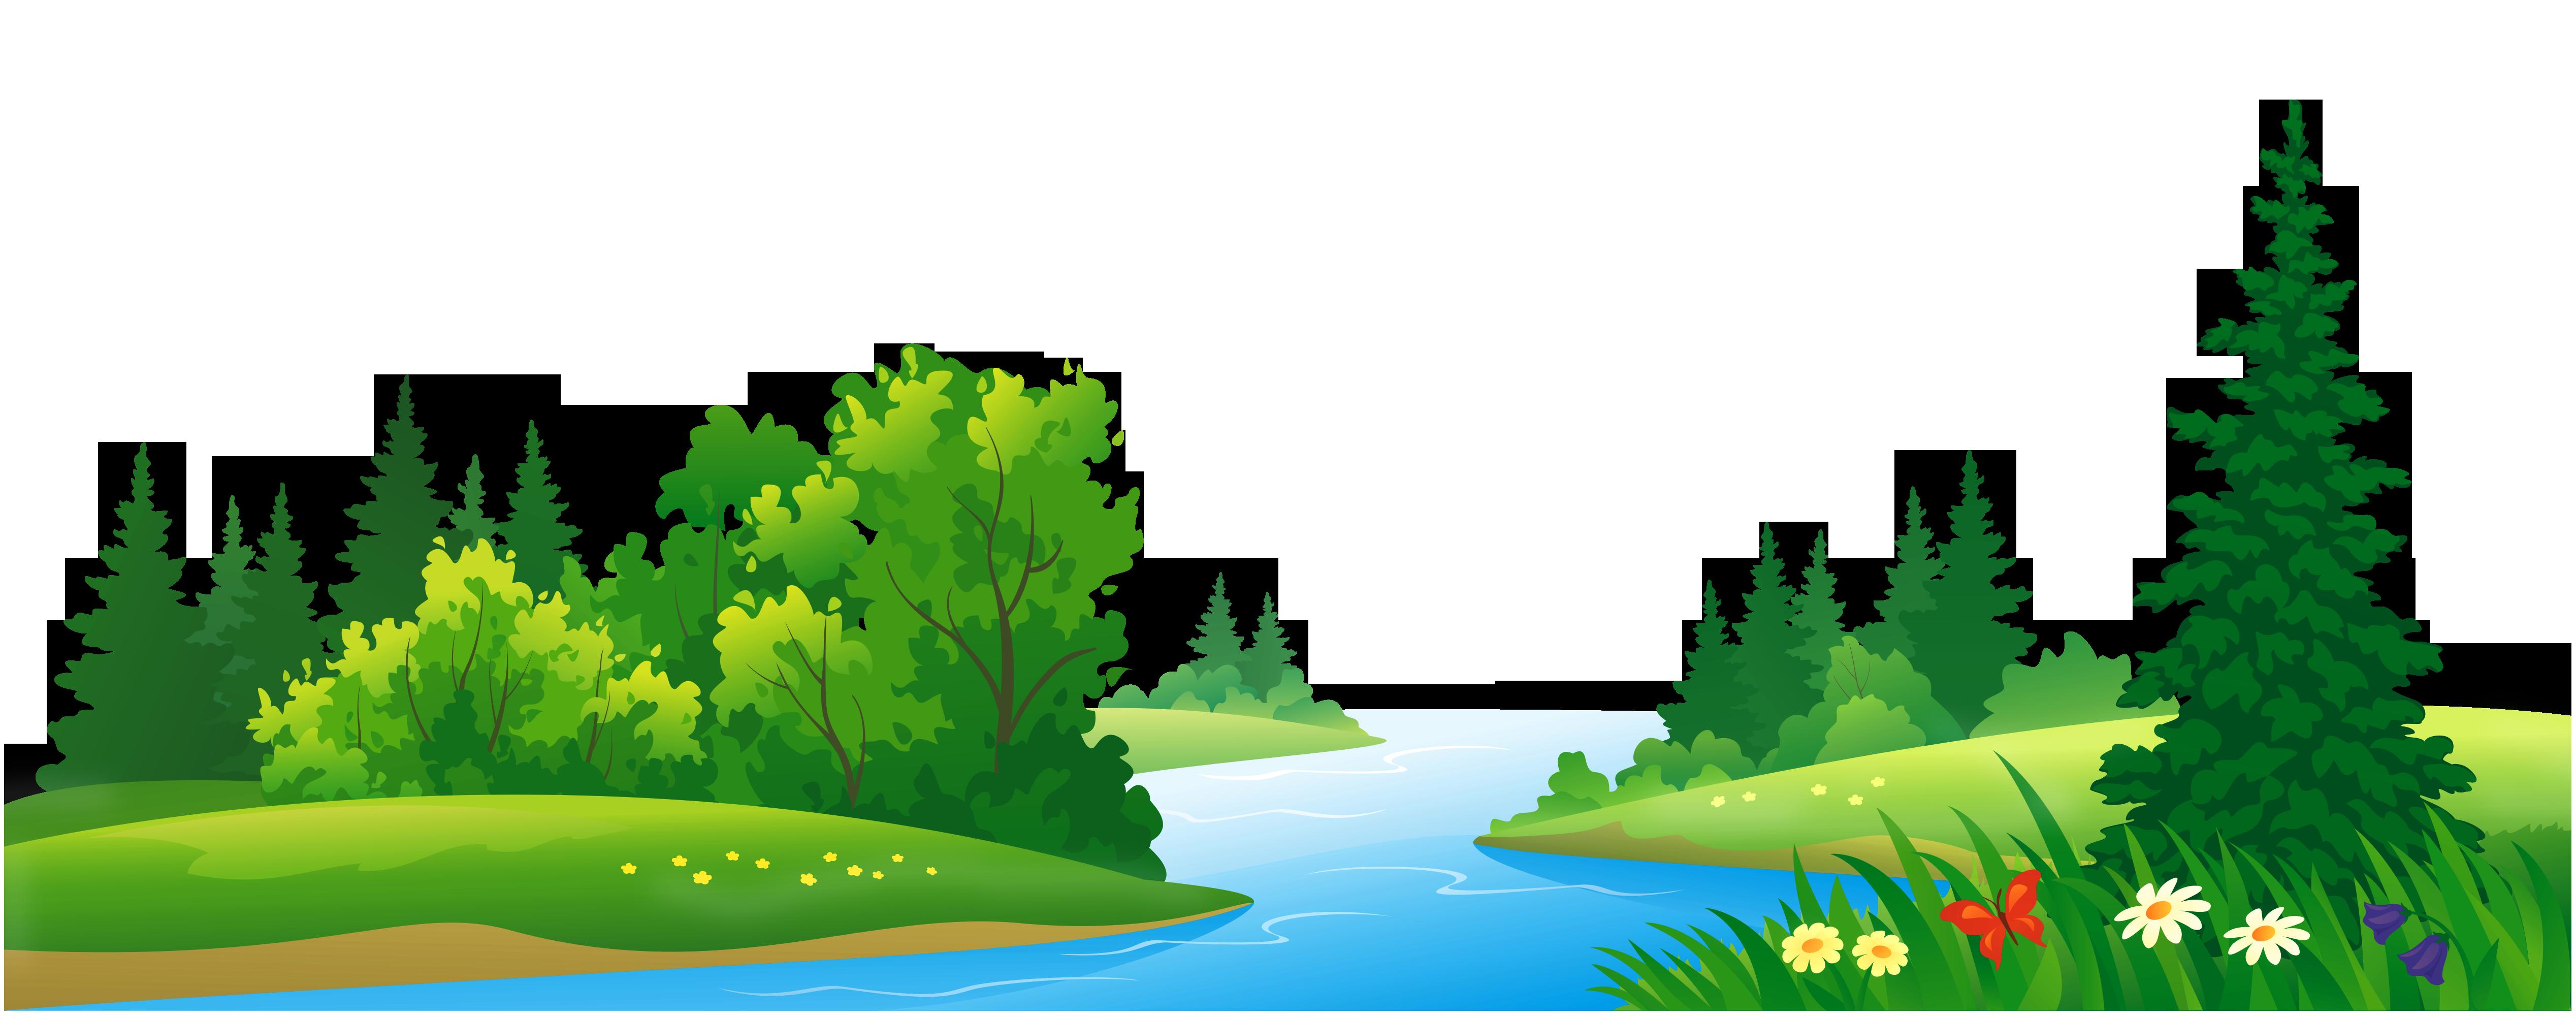 forest-clipart-lake-clip-art-rainforest-clipart